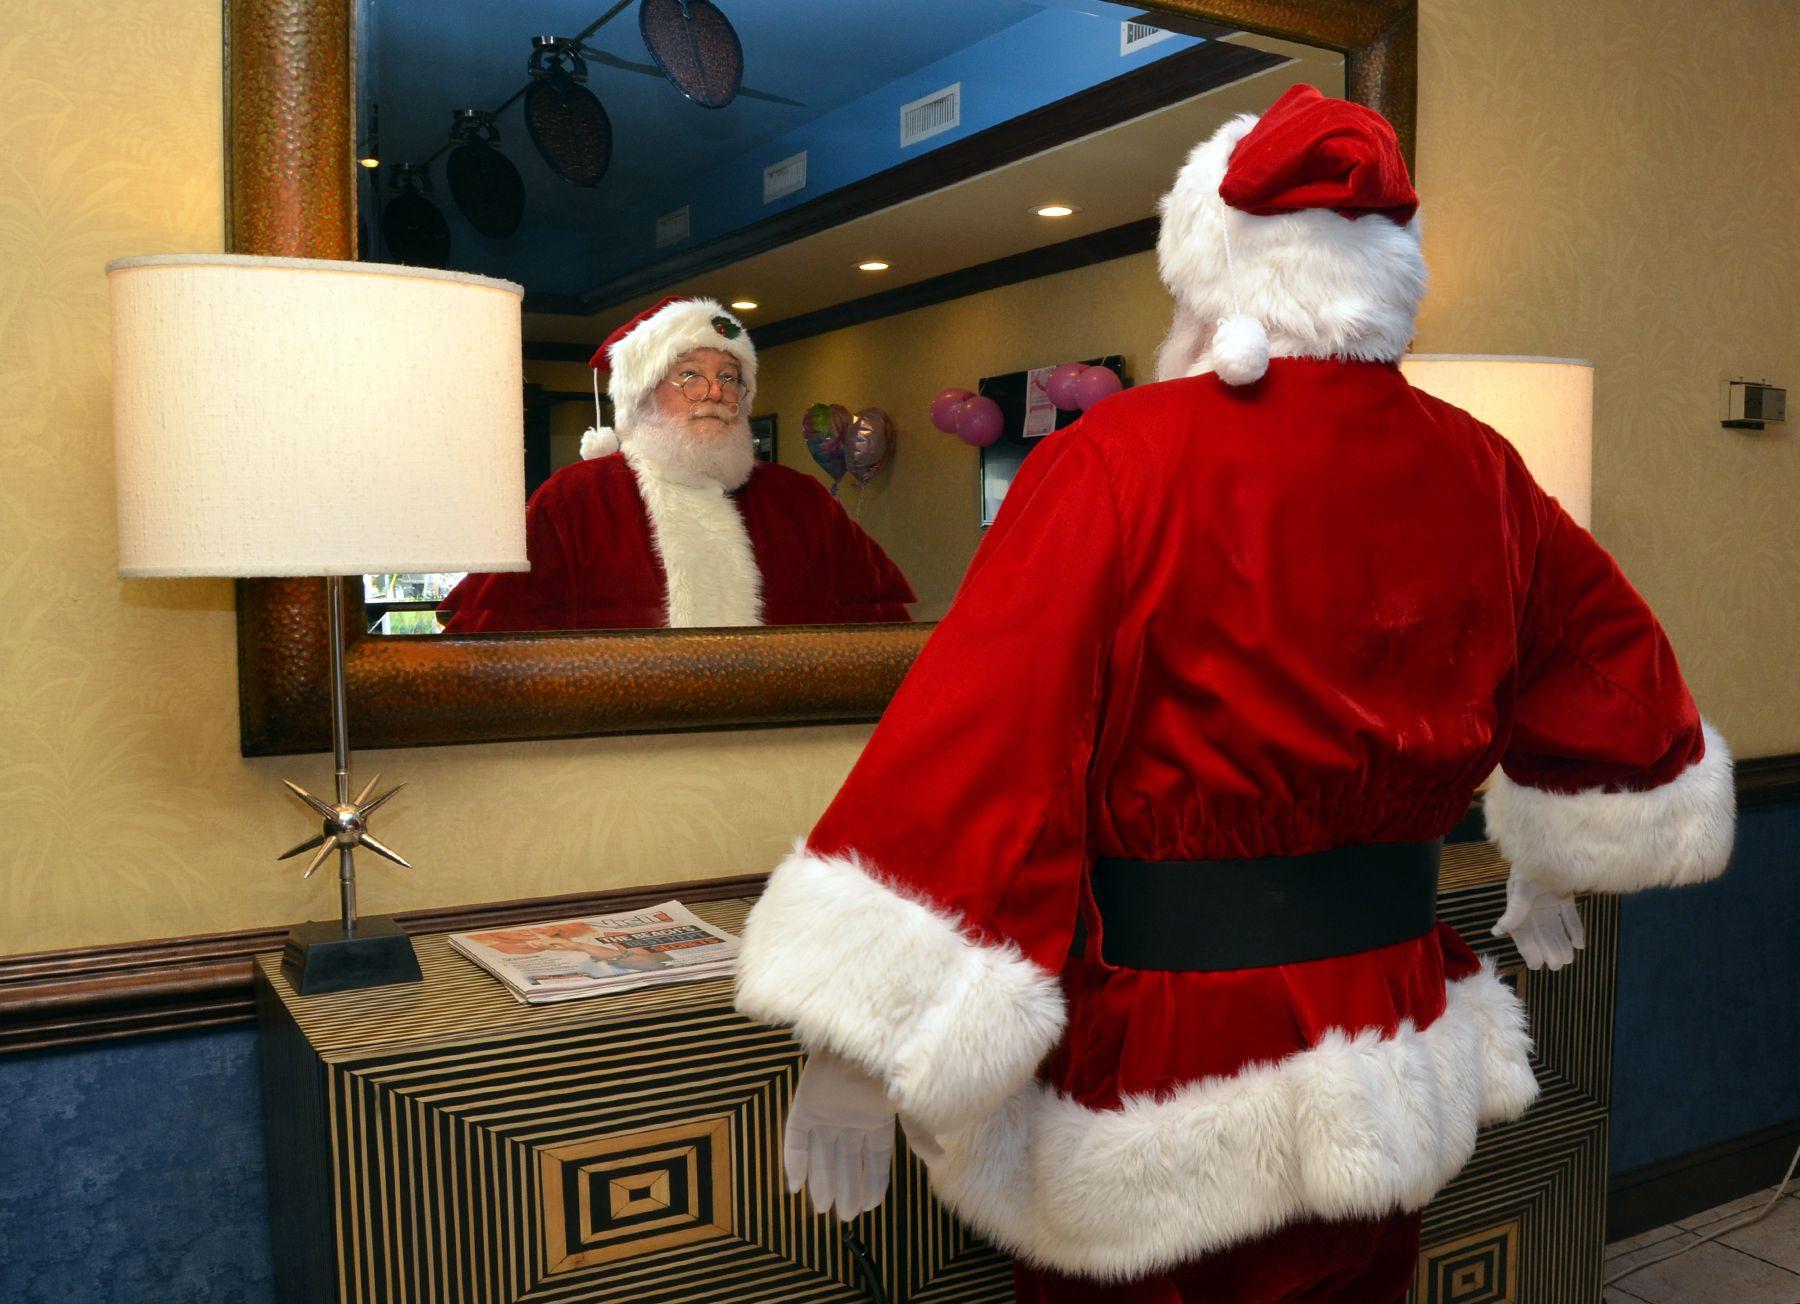 Santa admires himself in the mirror. #fun | Santa Visits Myrtle ...